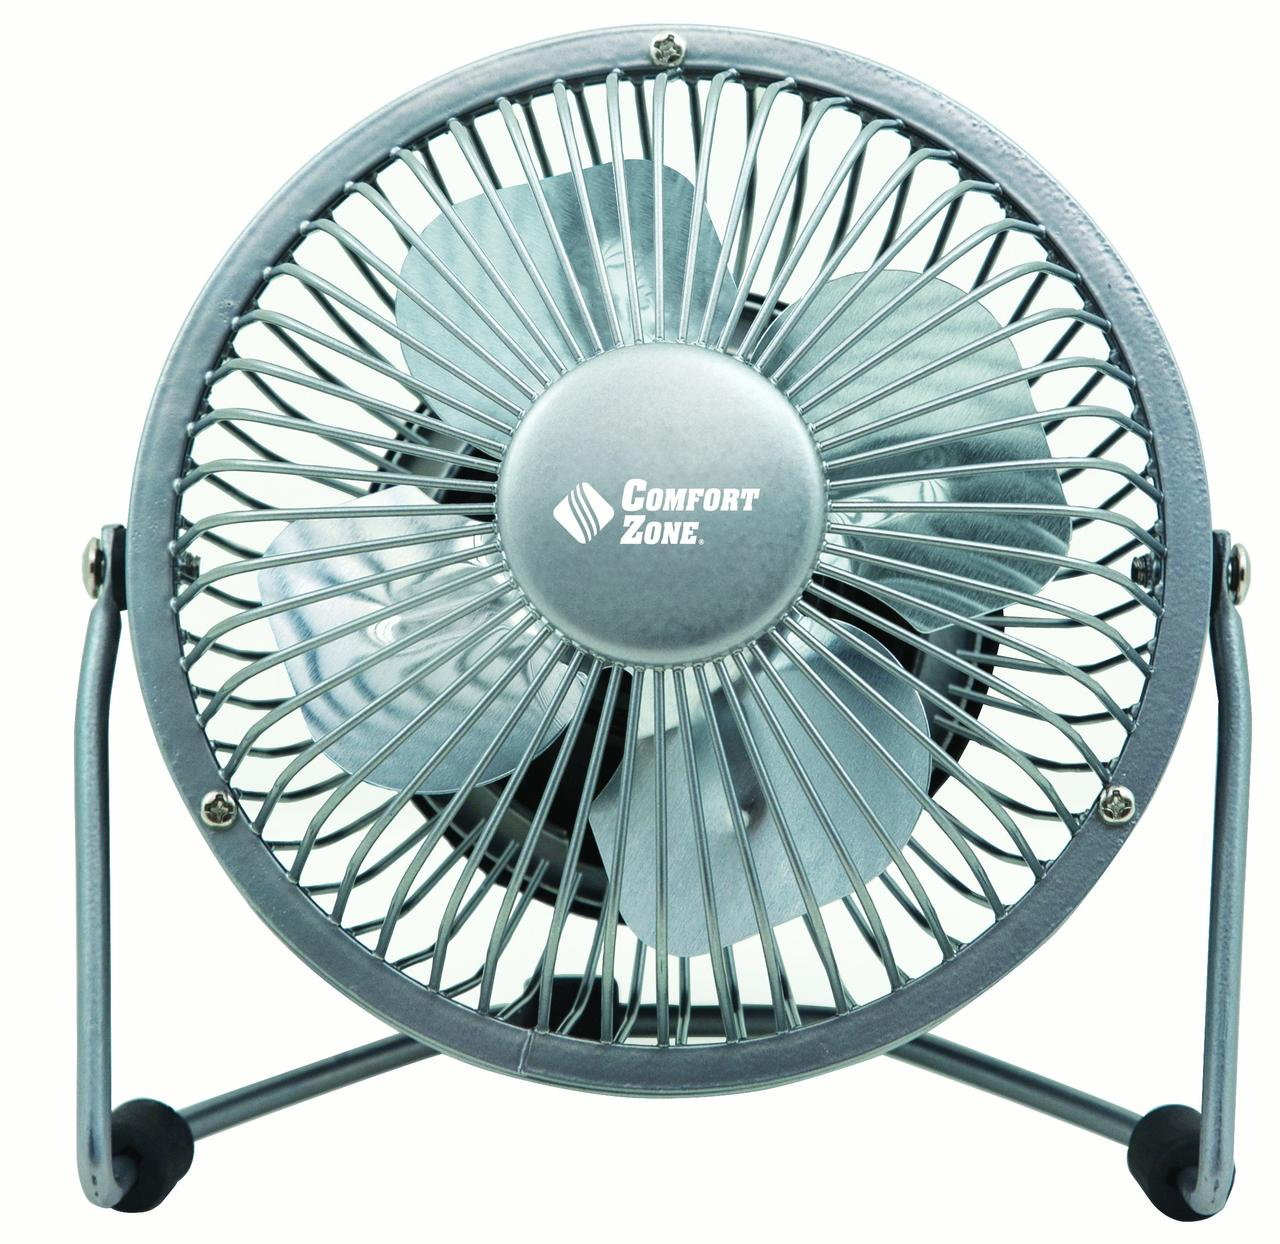 Comfort Zone CZHV44 in. Adjustable high-velocity Cradle Fan